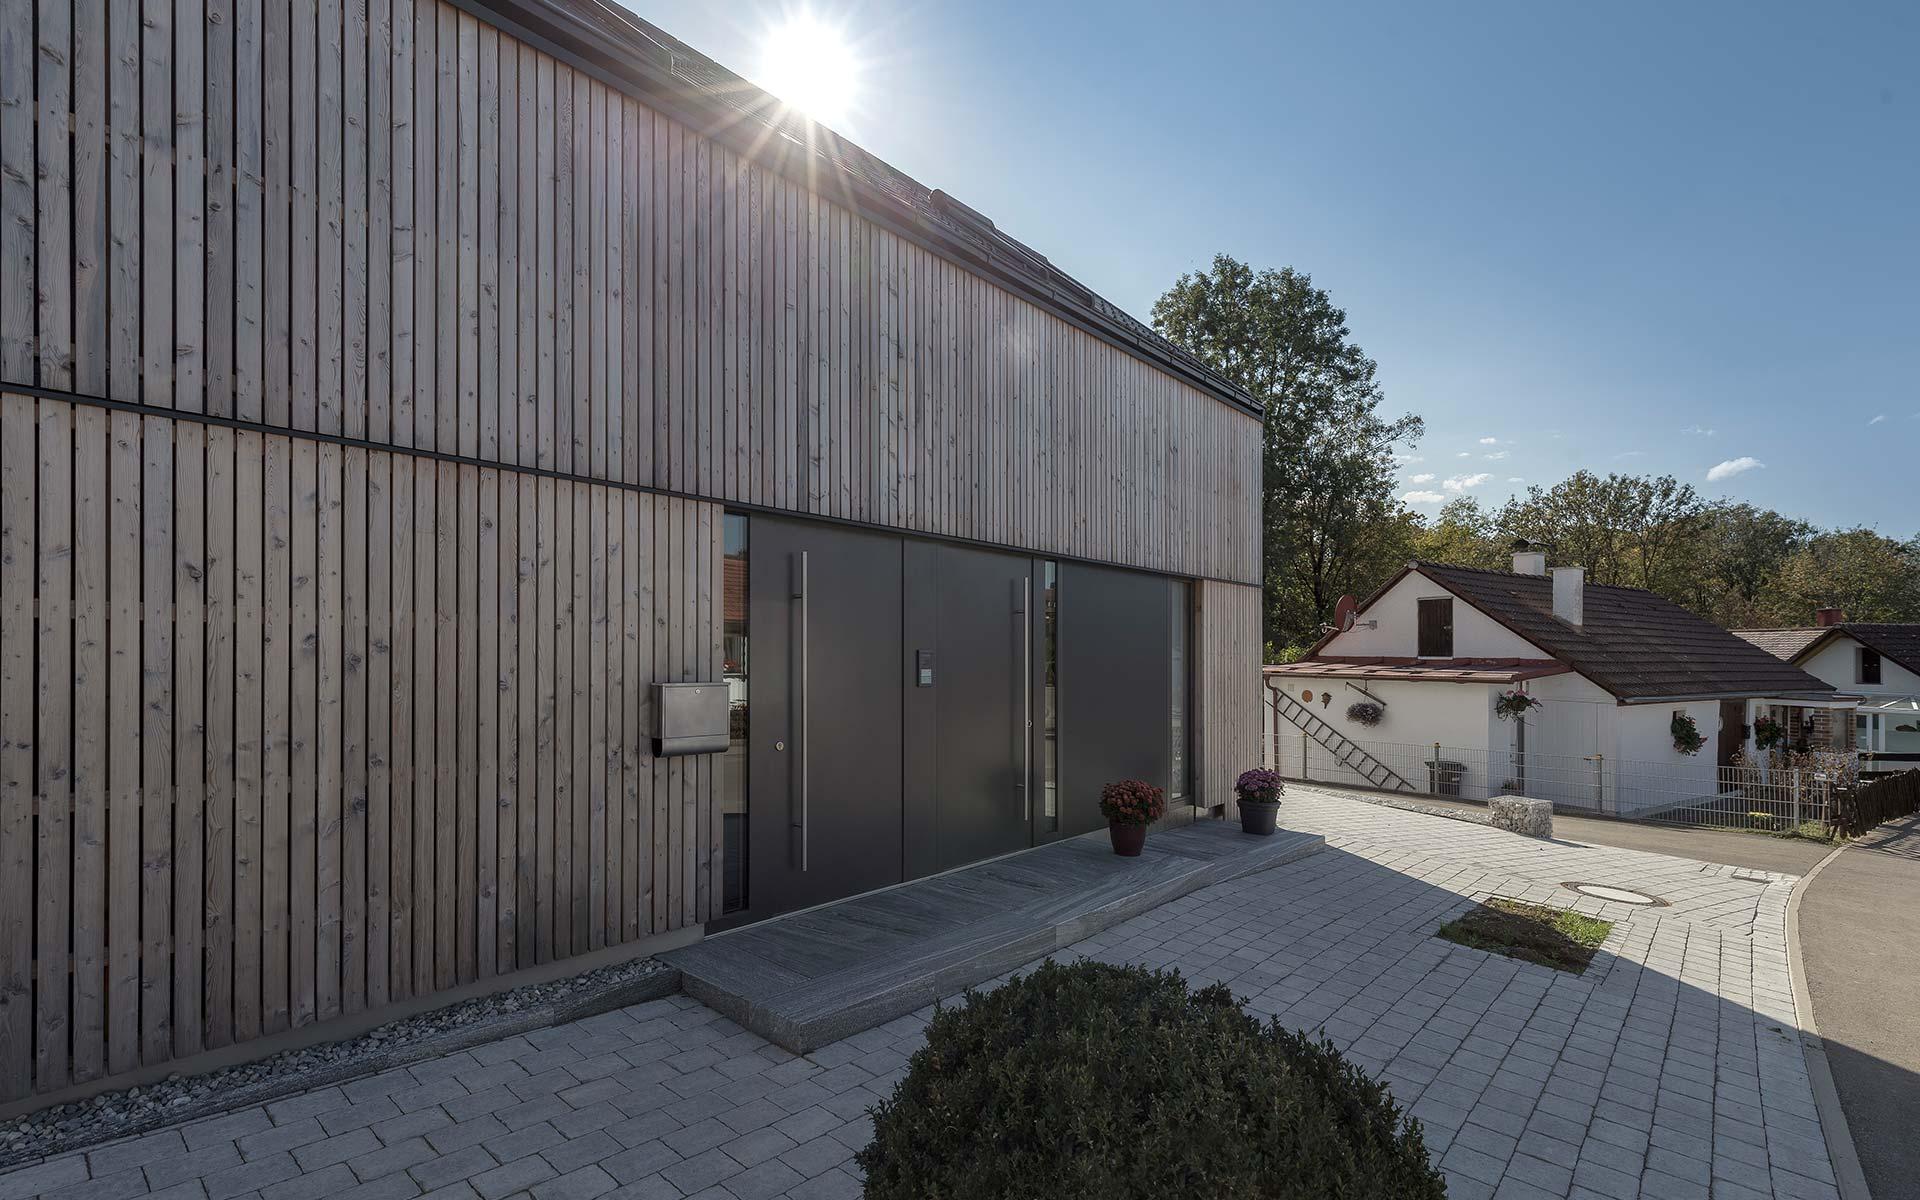 Architektenhaus aus Holz